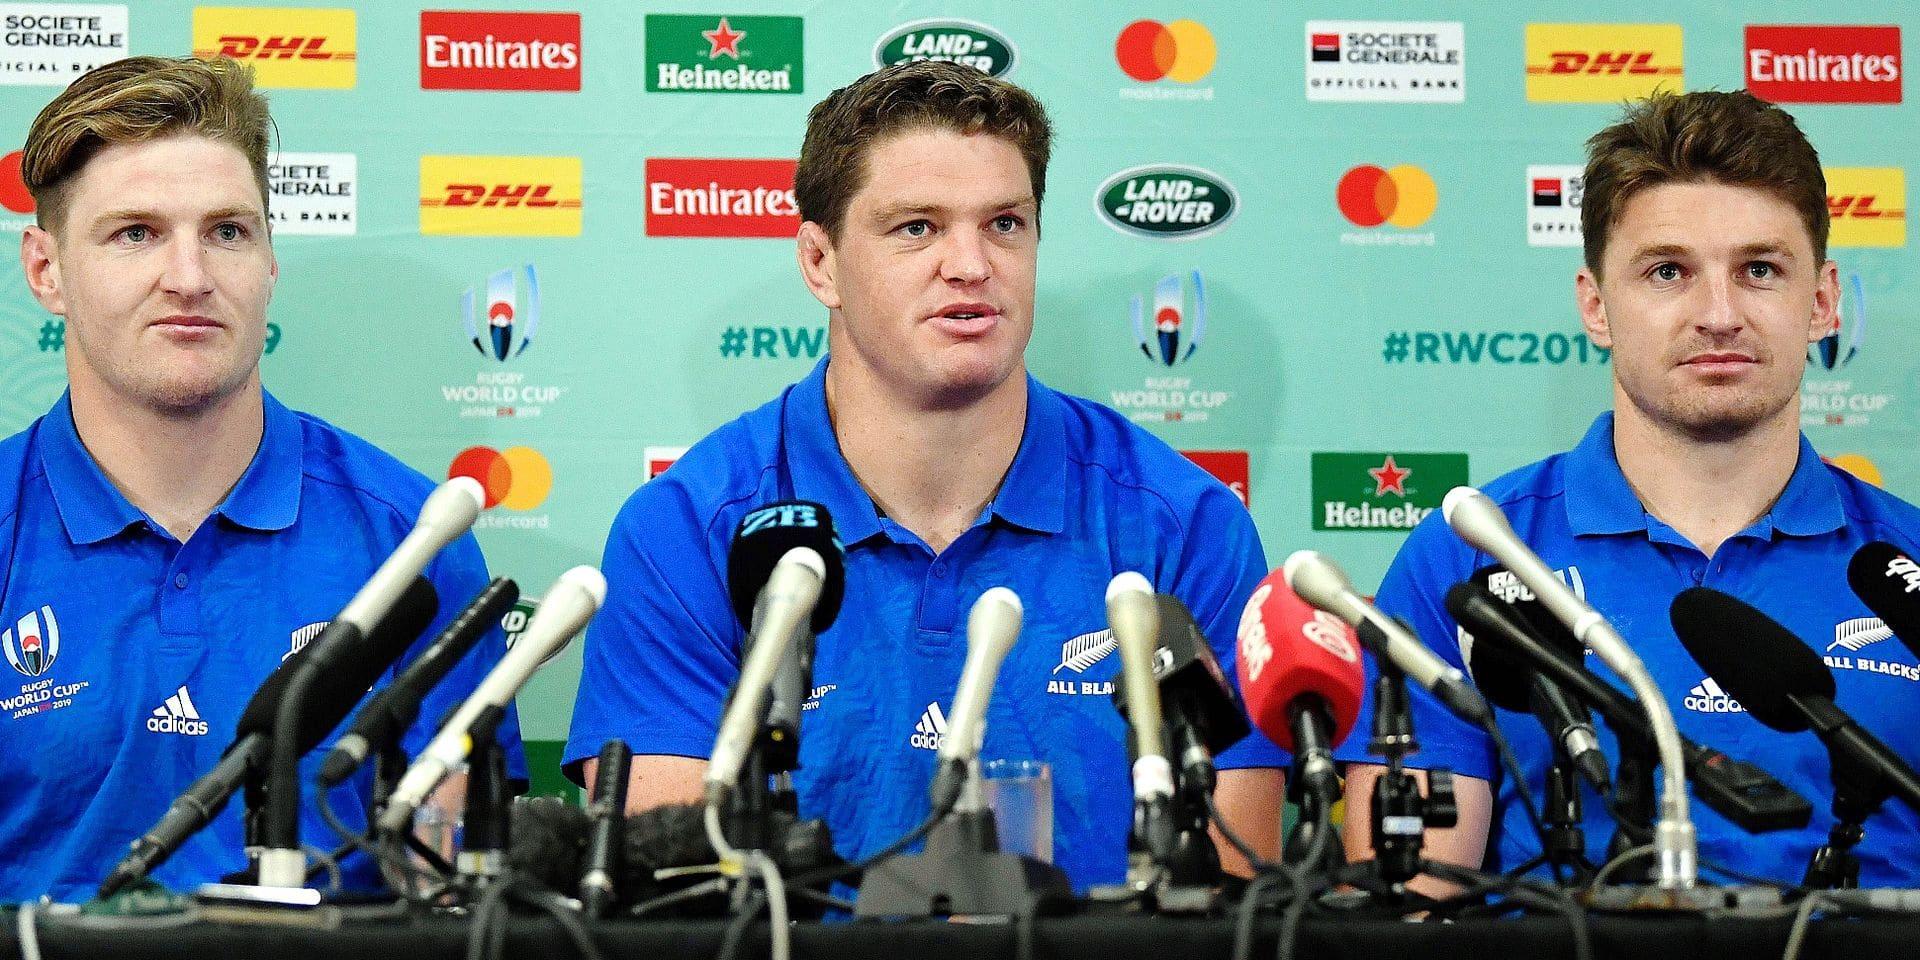 Qui sont Beauden, Scott et Jordie Barrett, une fratrie peu banale de rugbymen ?